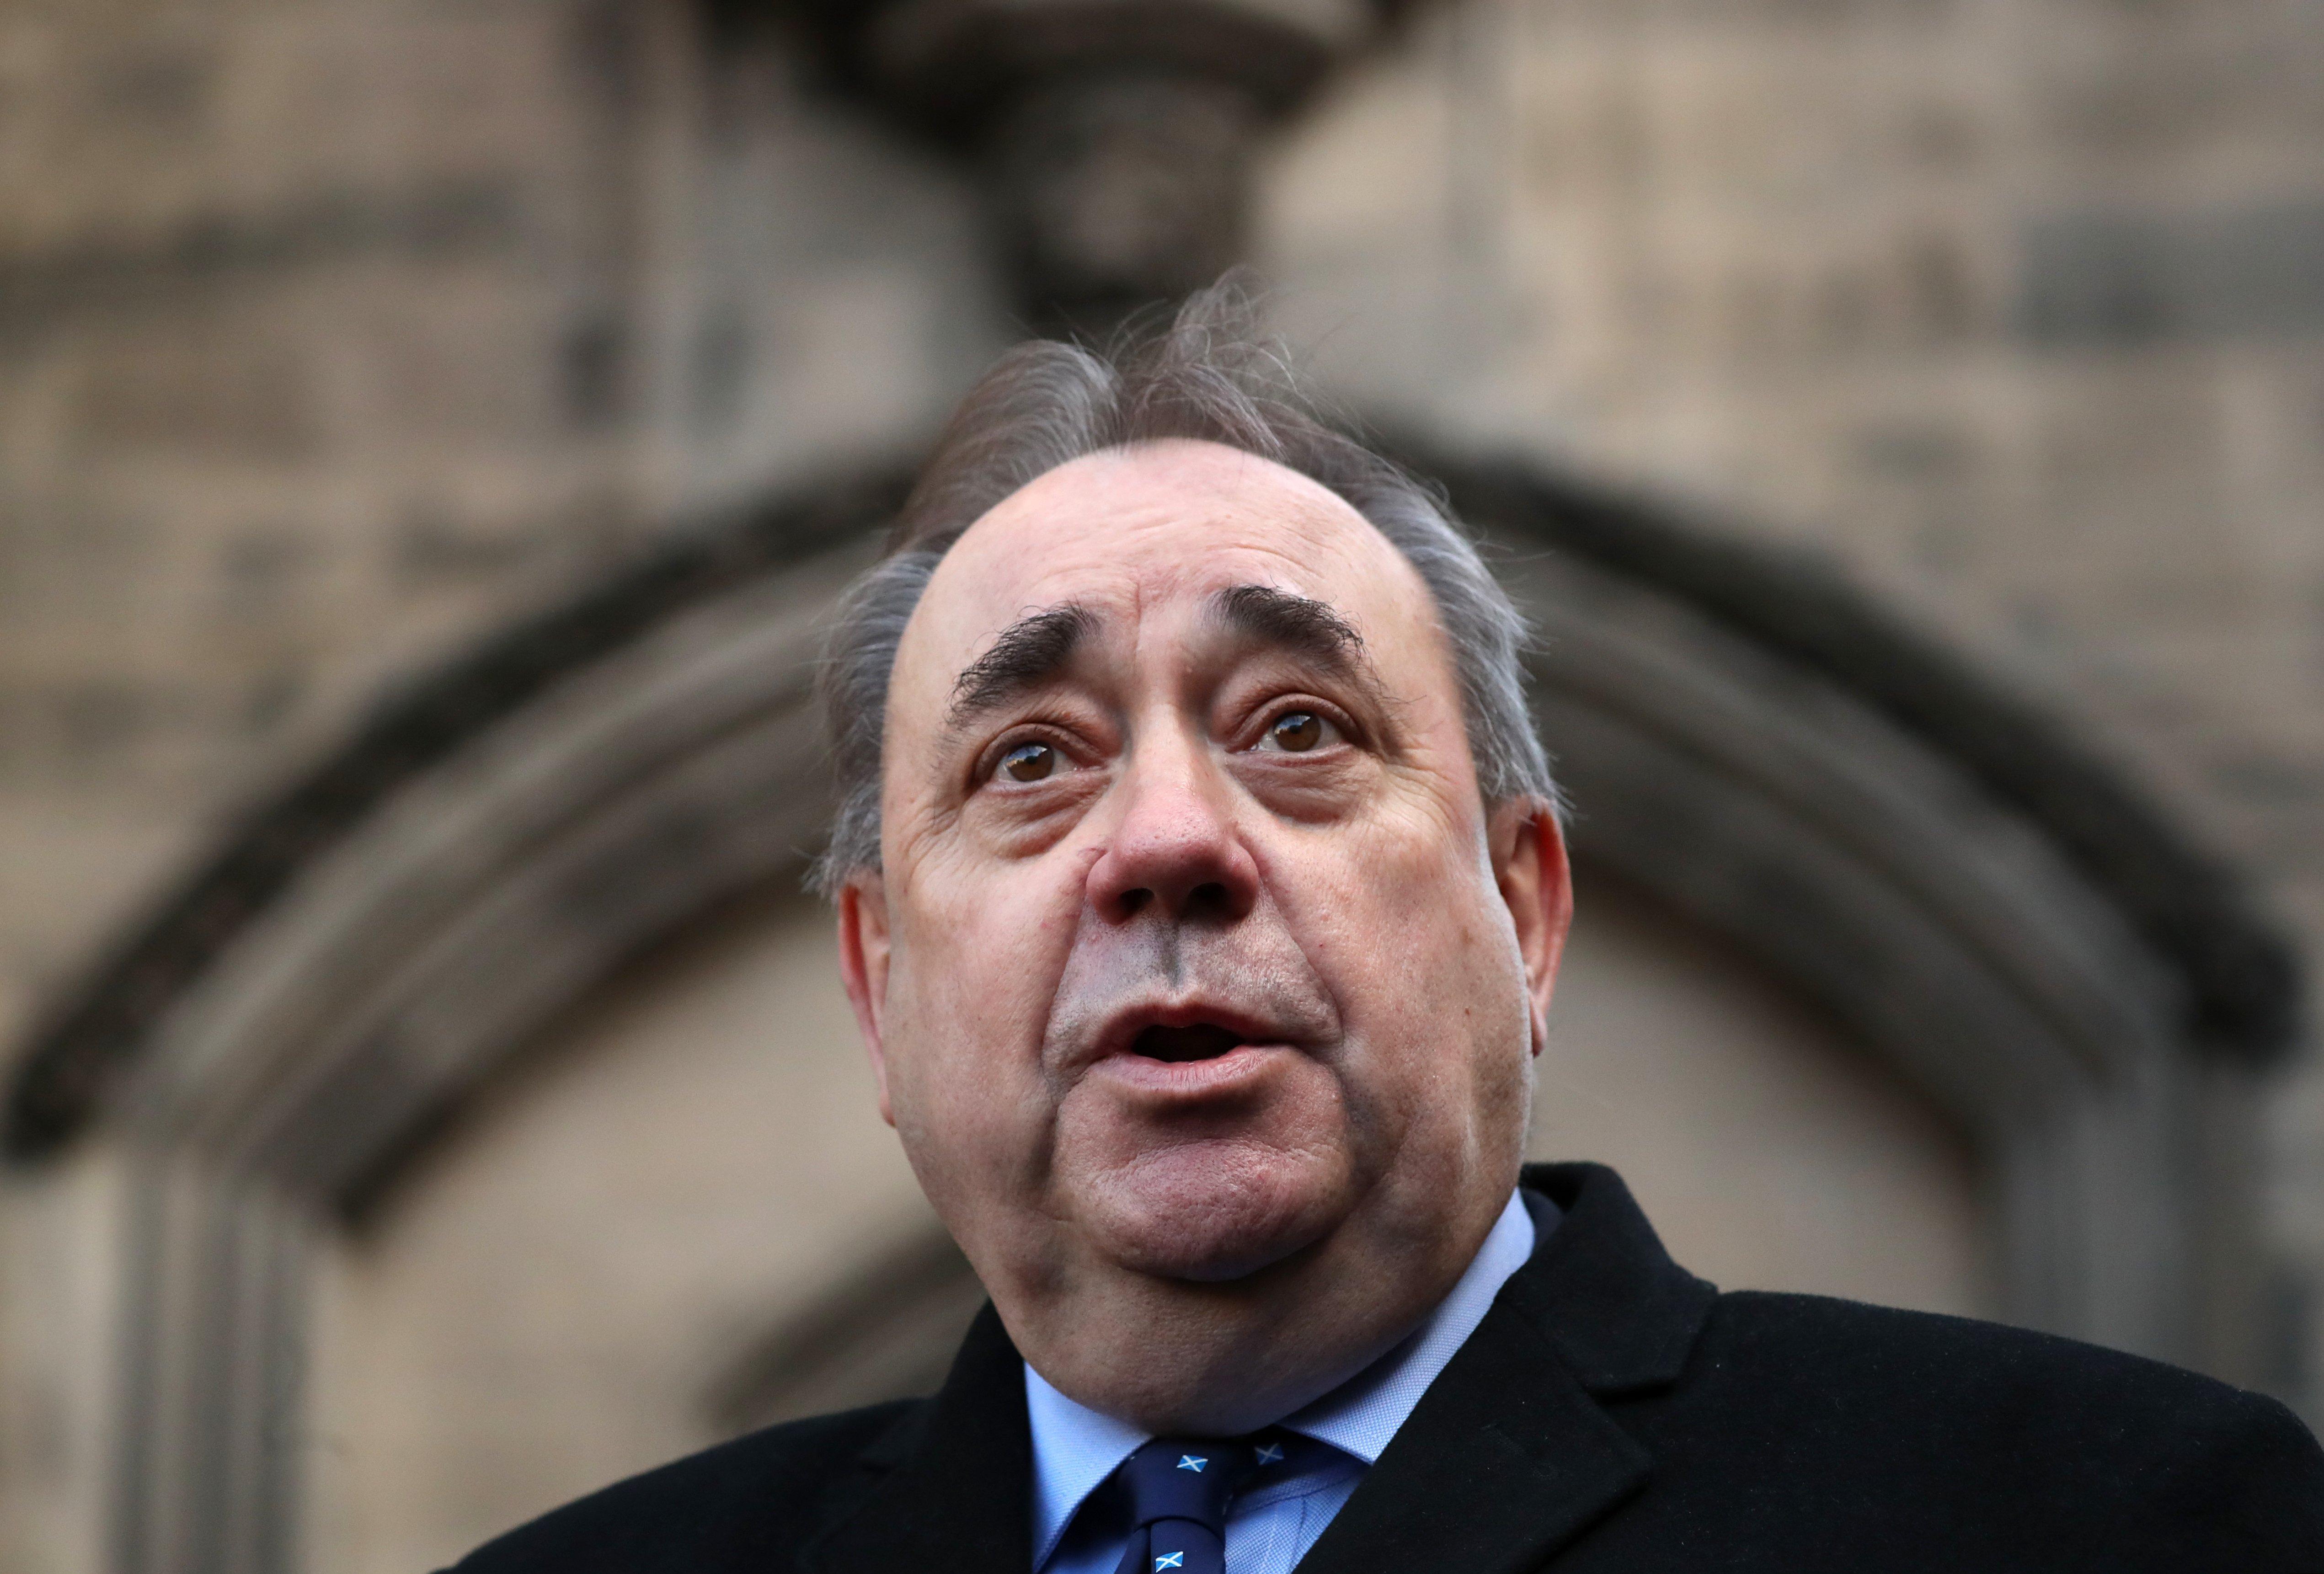 John Swinney tells MSPs no minutes held of key legal meetings over Salmond case